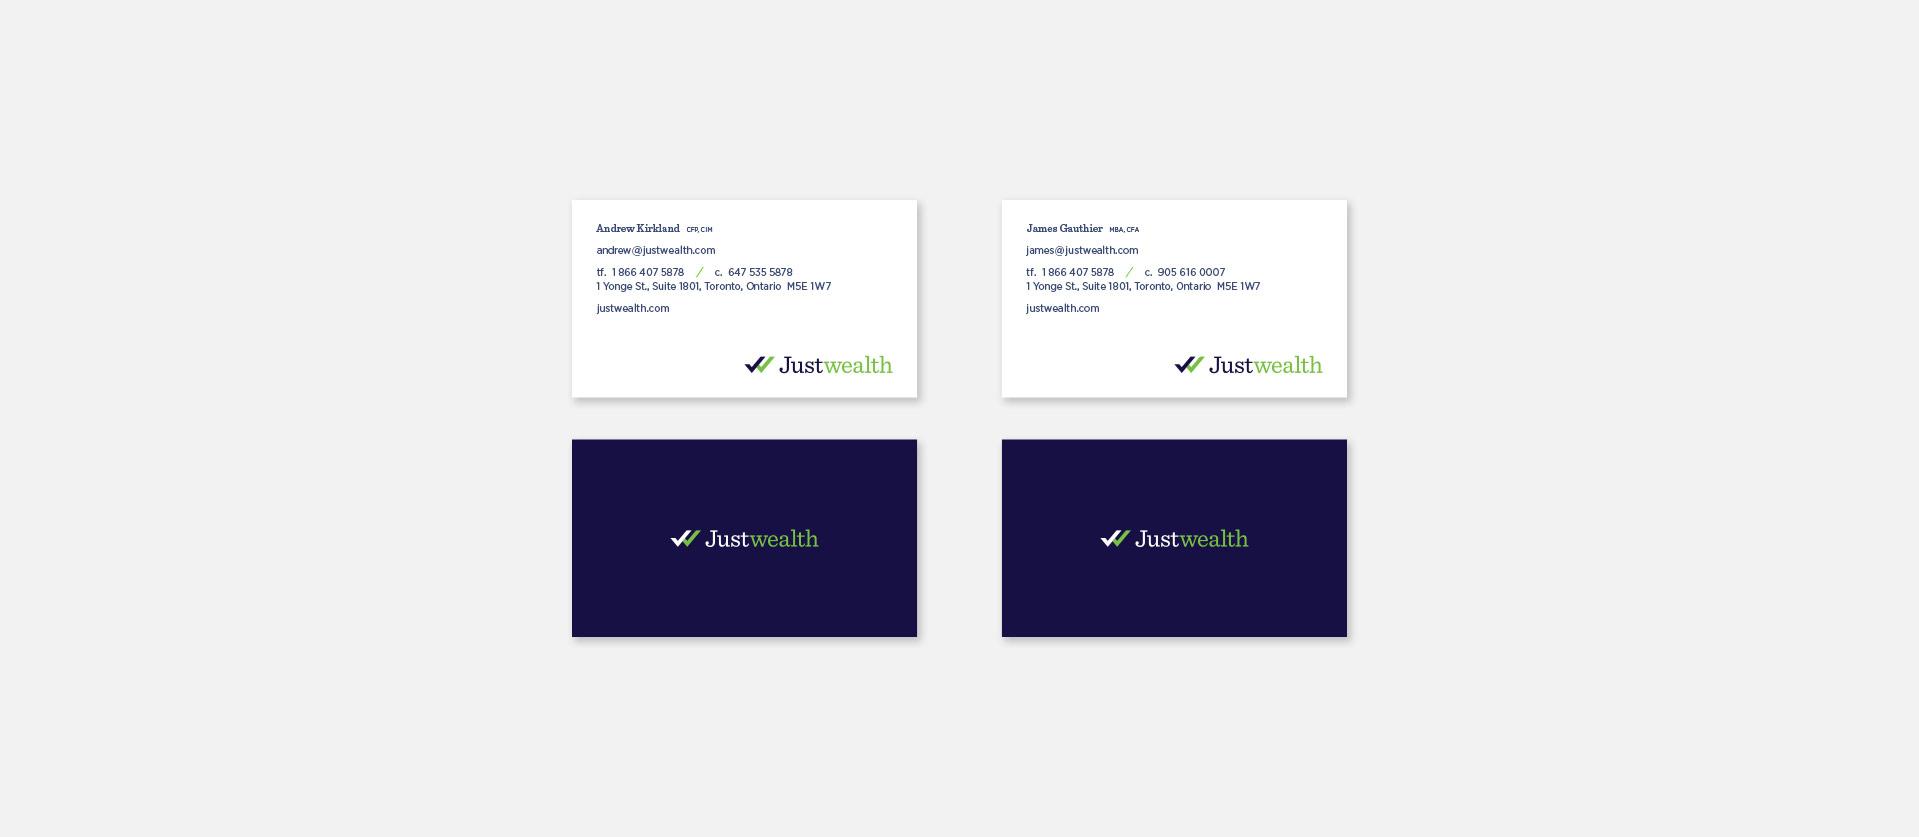 Justwealth Busines Card Design